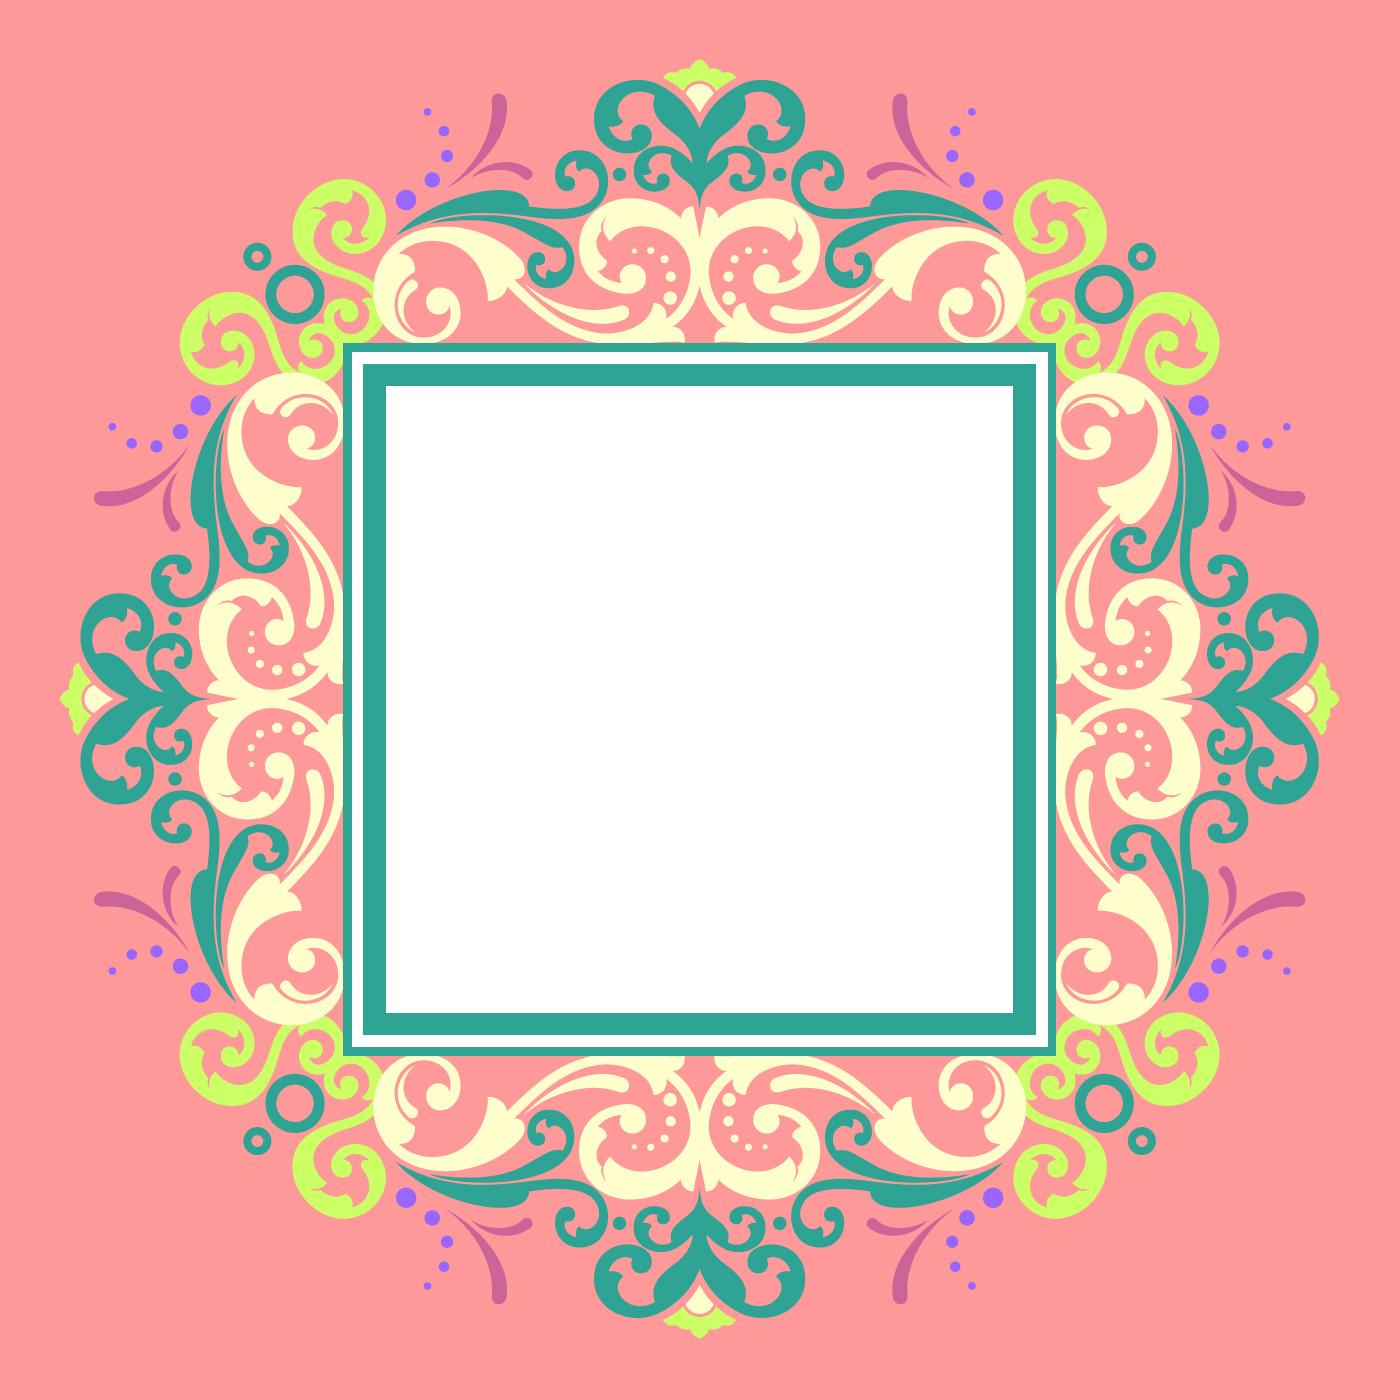 Square Border Free Vector Art 4835 Free Downloads